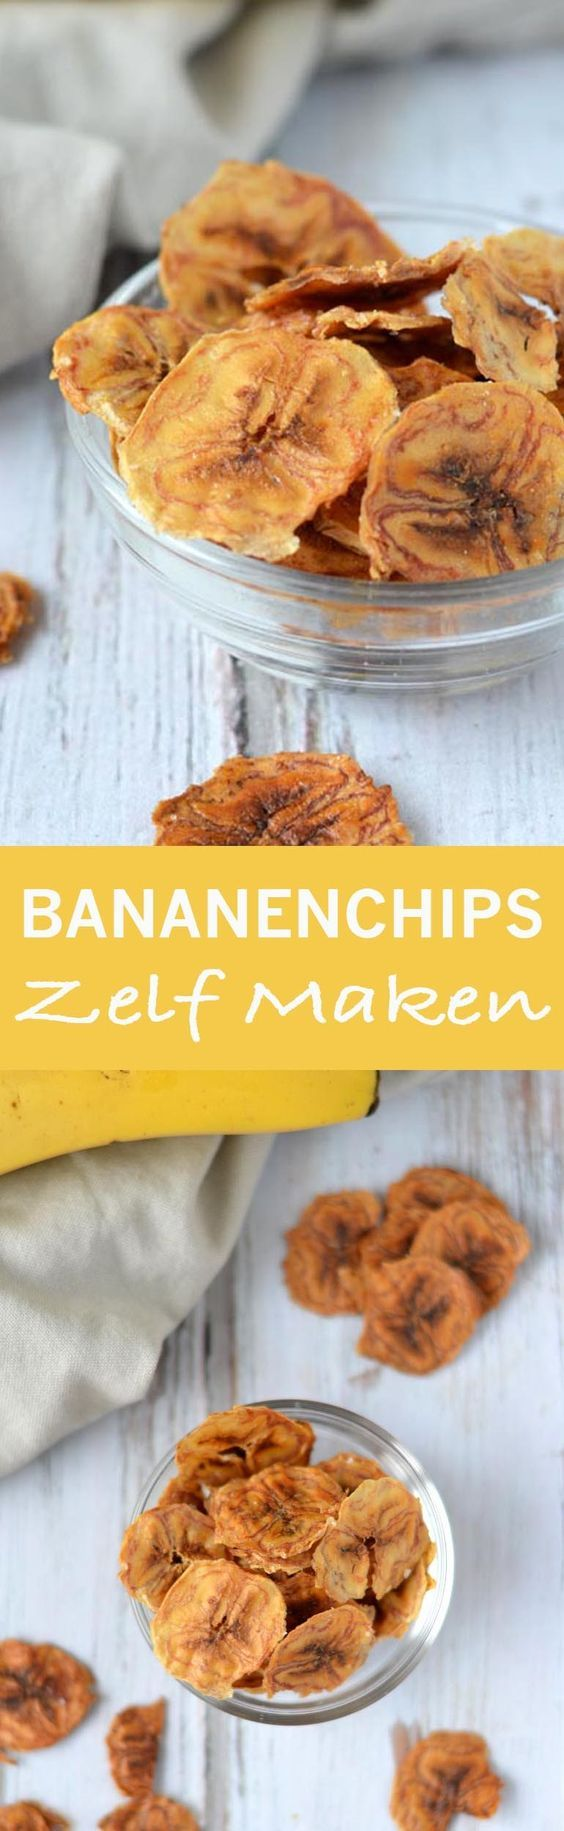 Bananenchips Maken (Airfryer of Oven) Recipe Air fryer